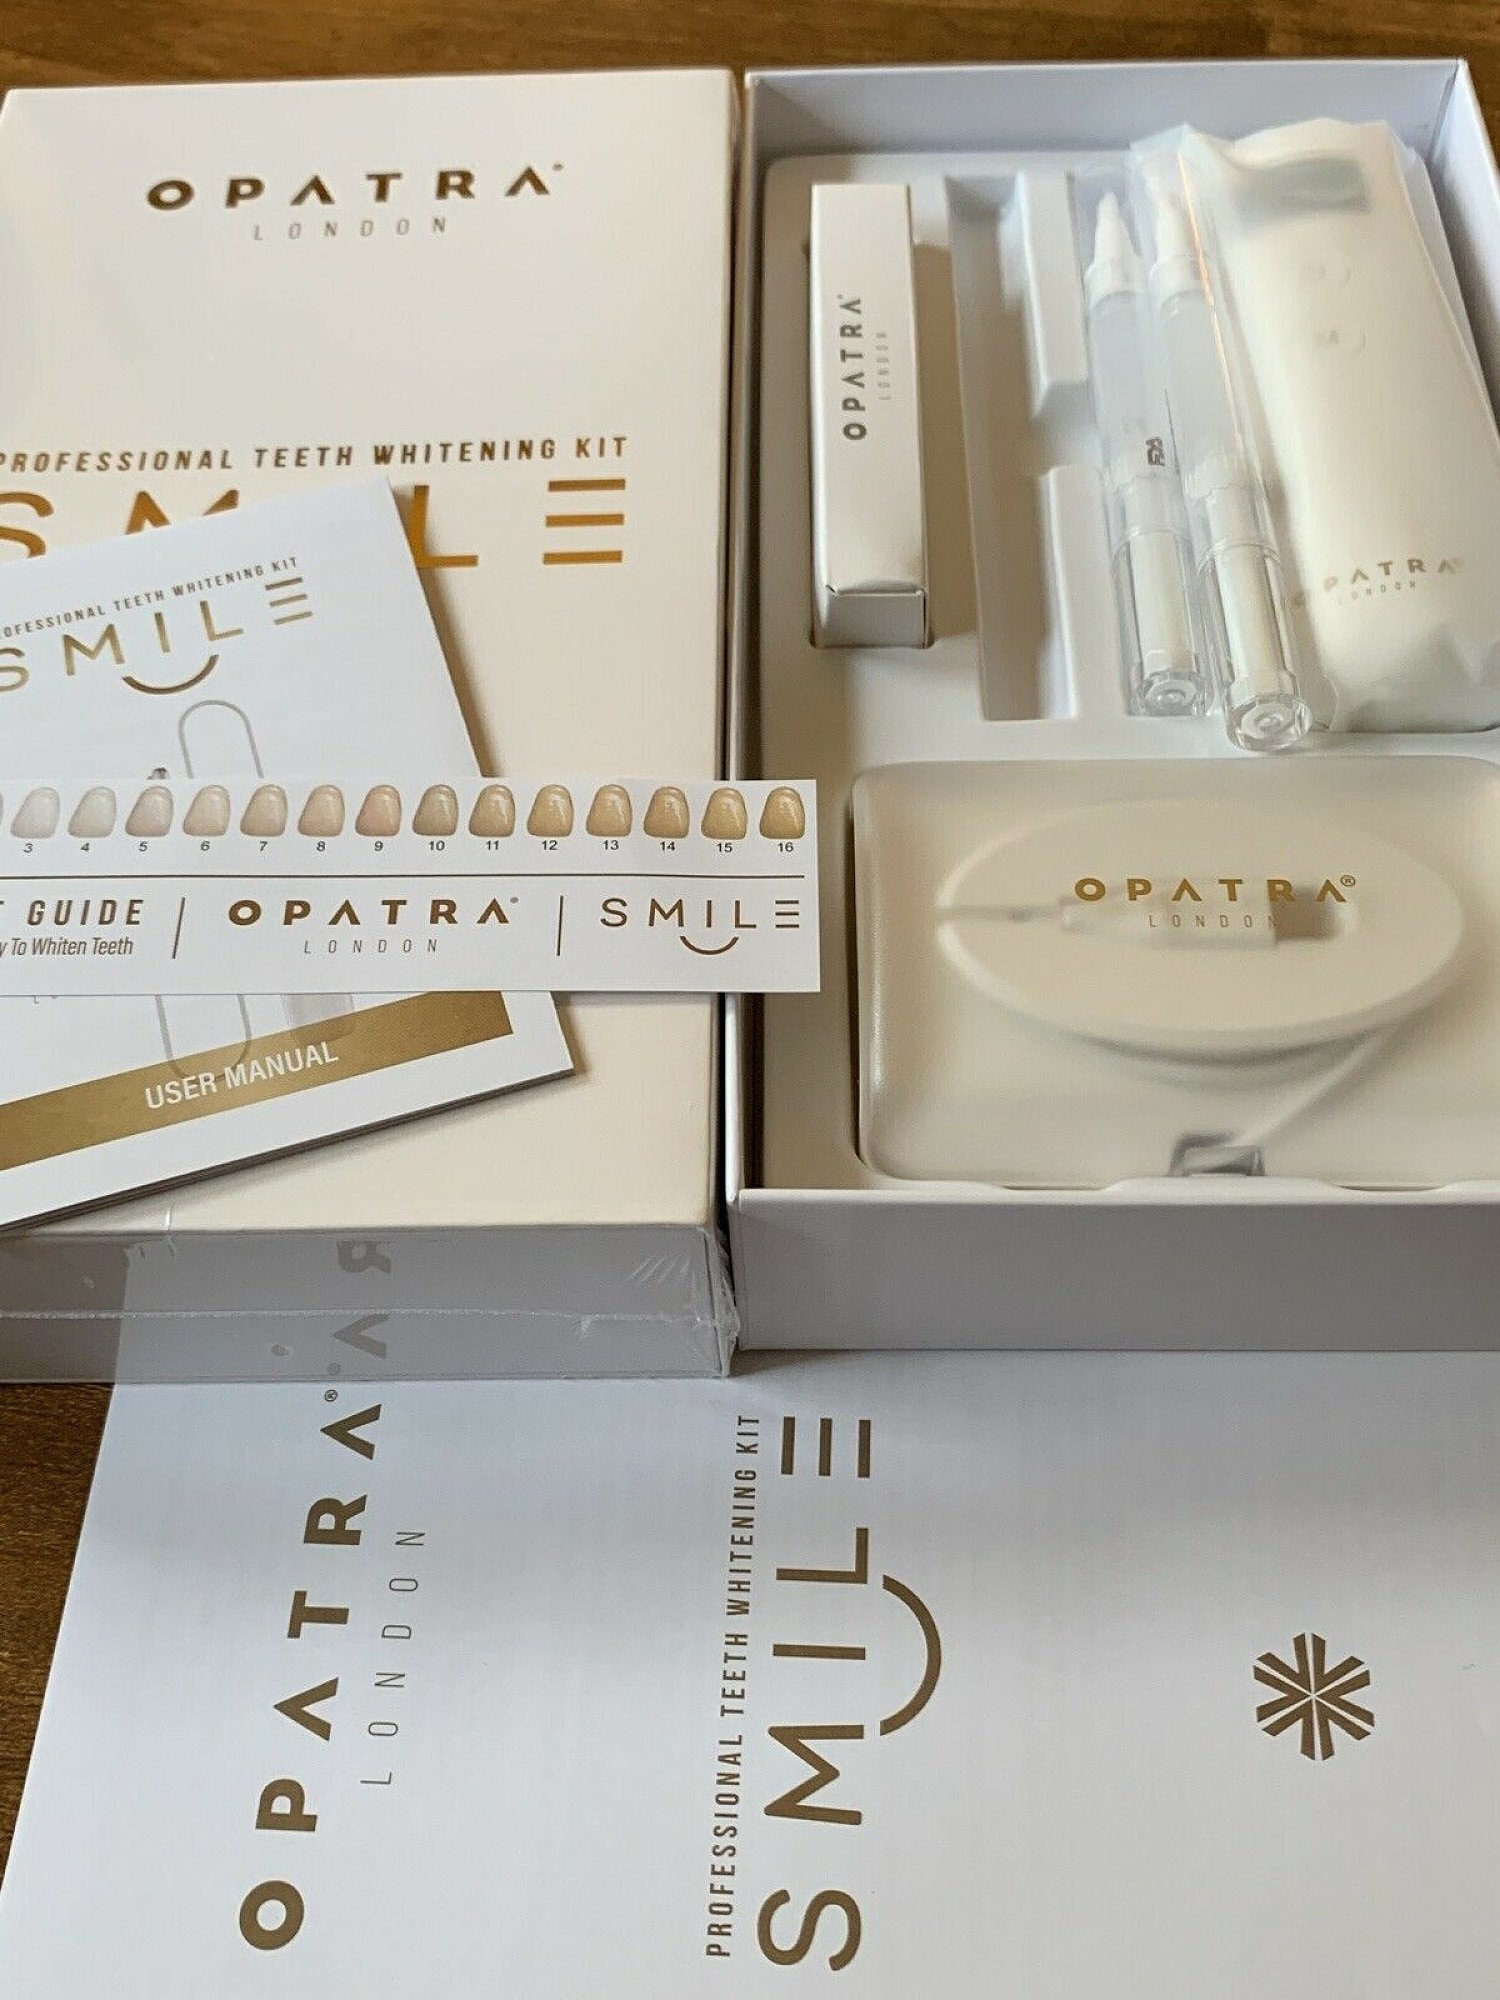 Opatra Smile Teeth Whitening Kit worth £599